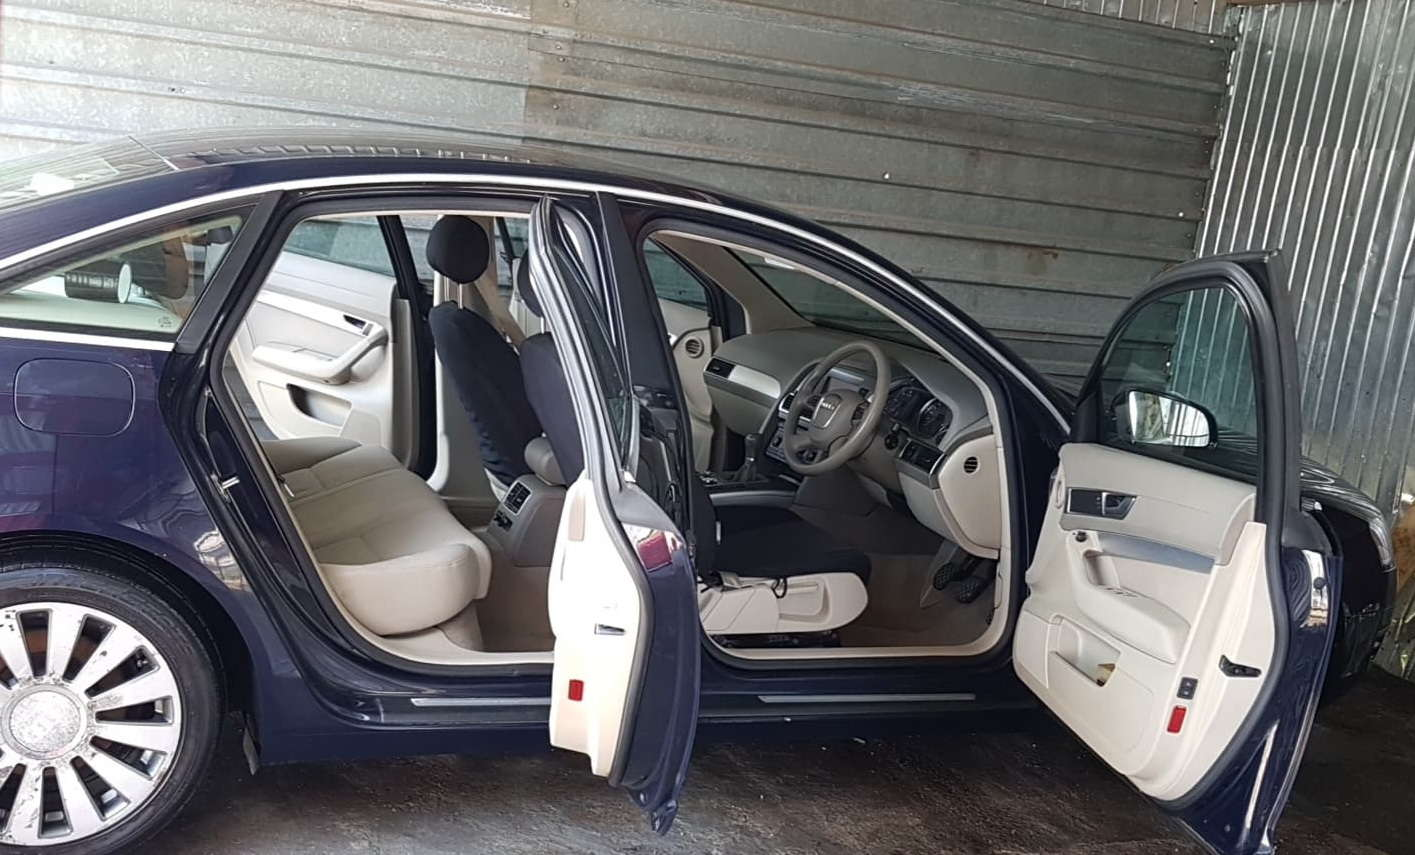 curatare aburi tapiterie detailing auto spalare aburi spalatorie interior auto